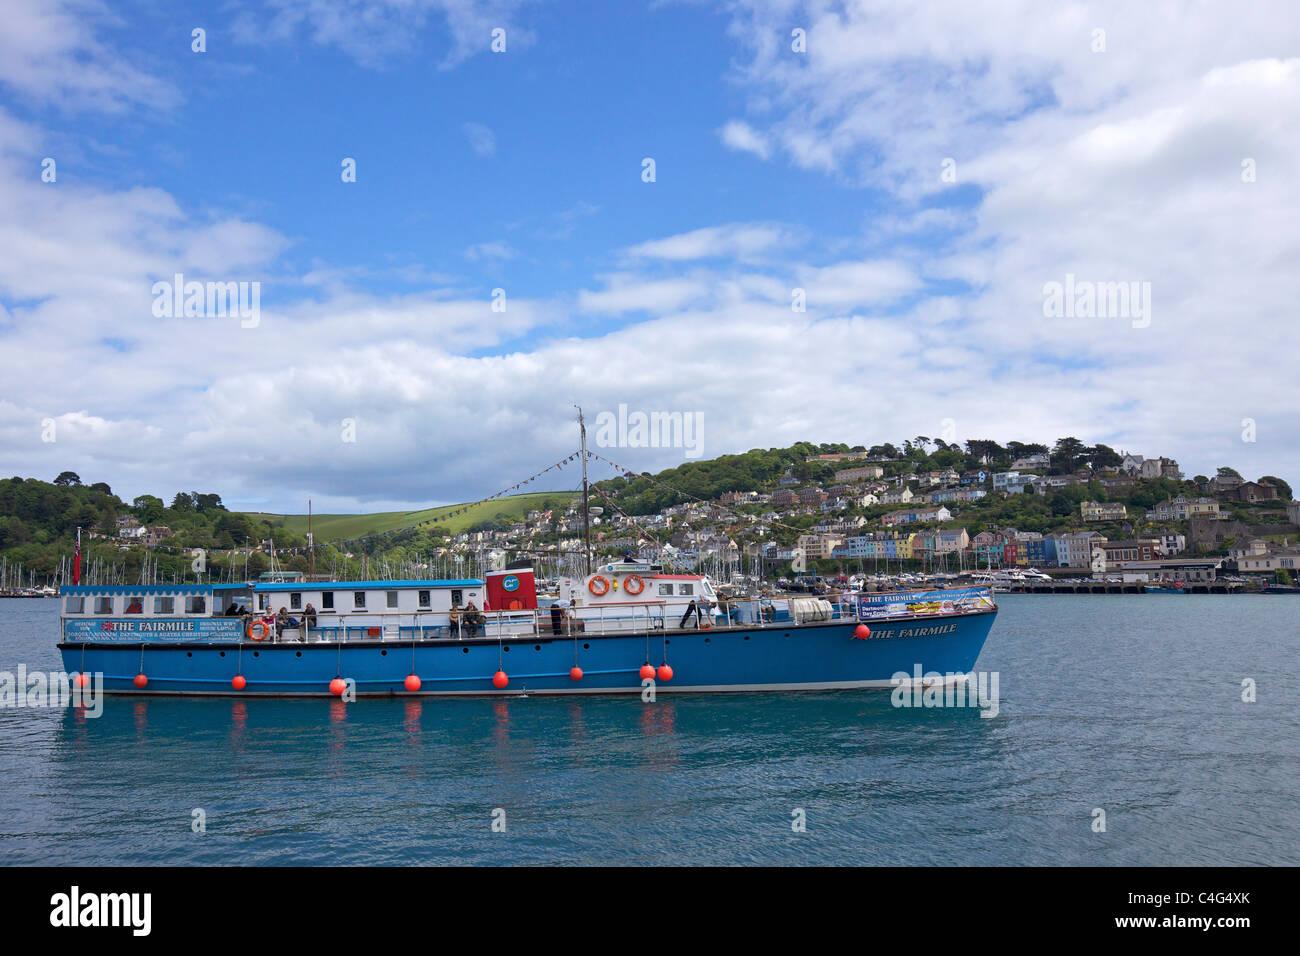 Fairmile passenger tourist ship in Dart estuary Dartmouth, Devon England UK GB British Isles - Stock Image